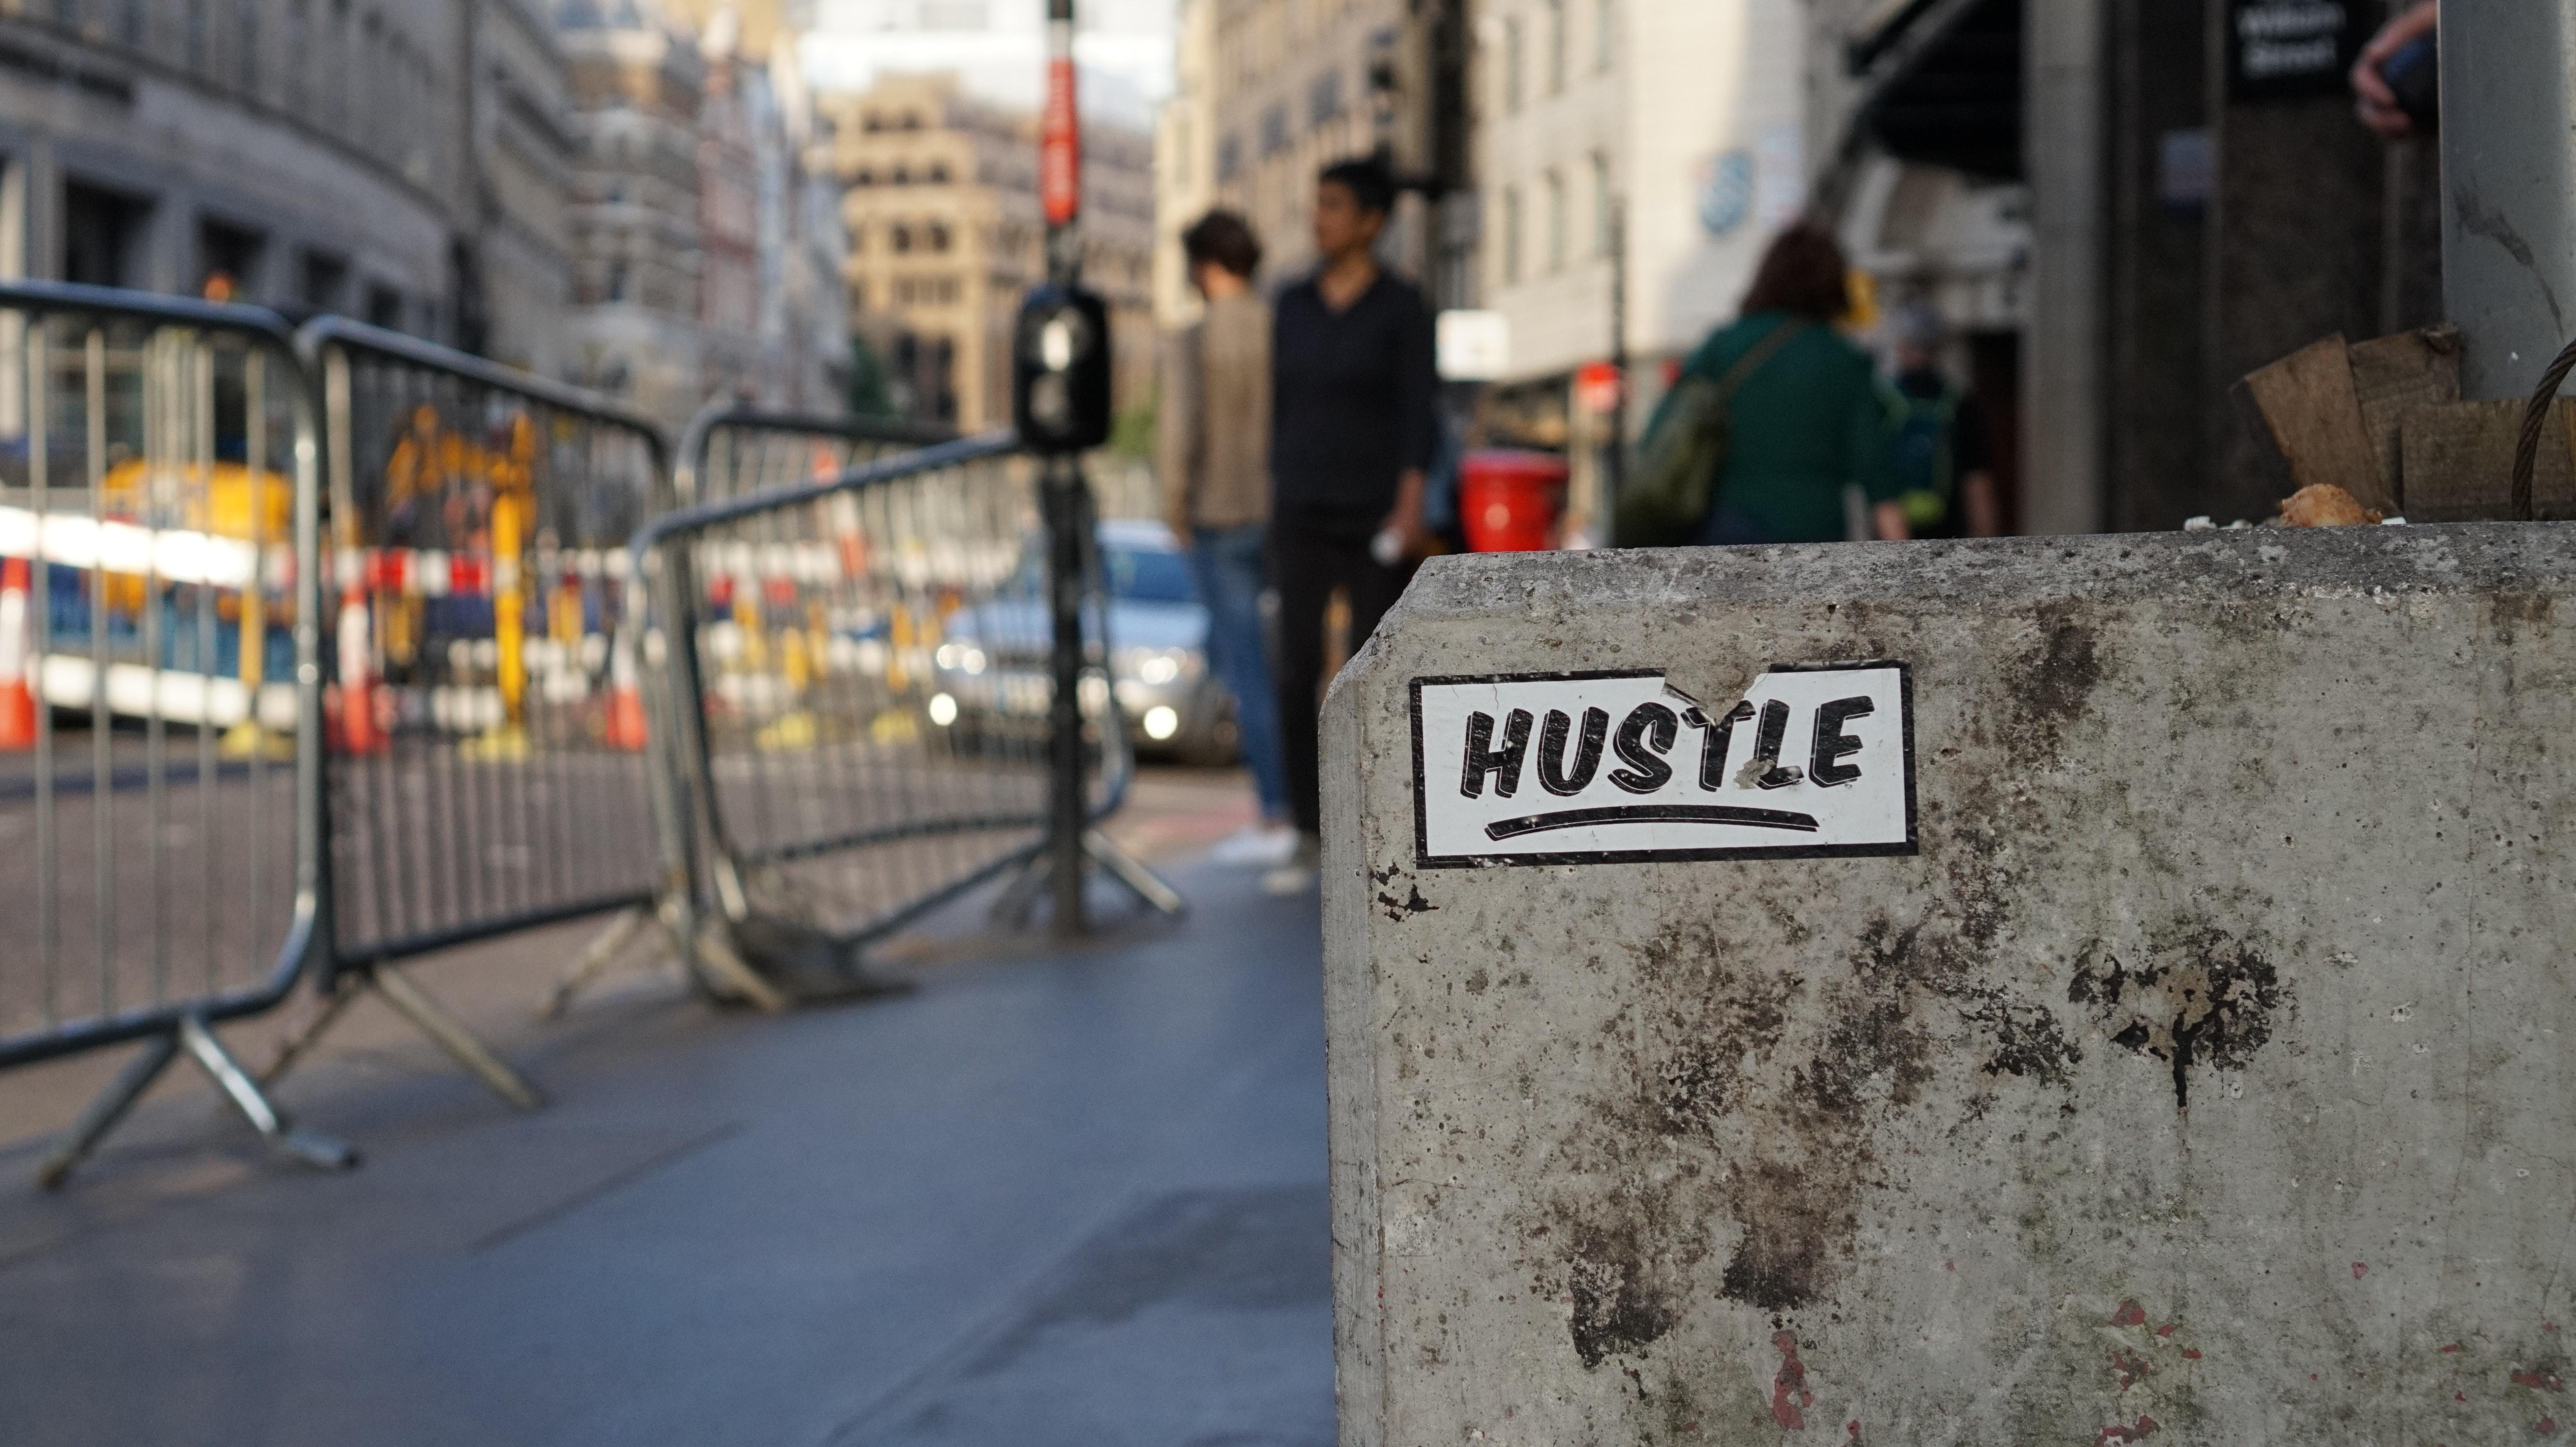 Side Hustles and the Gig Economy Explained